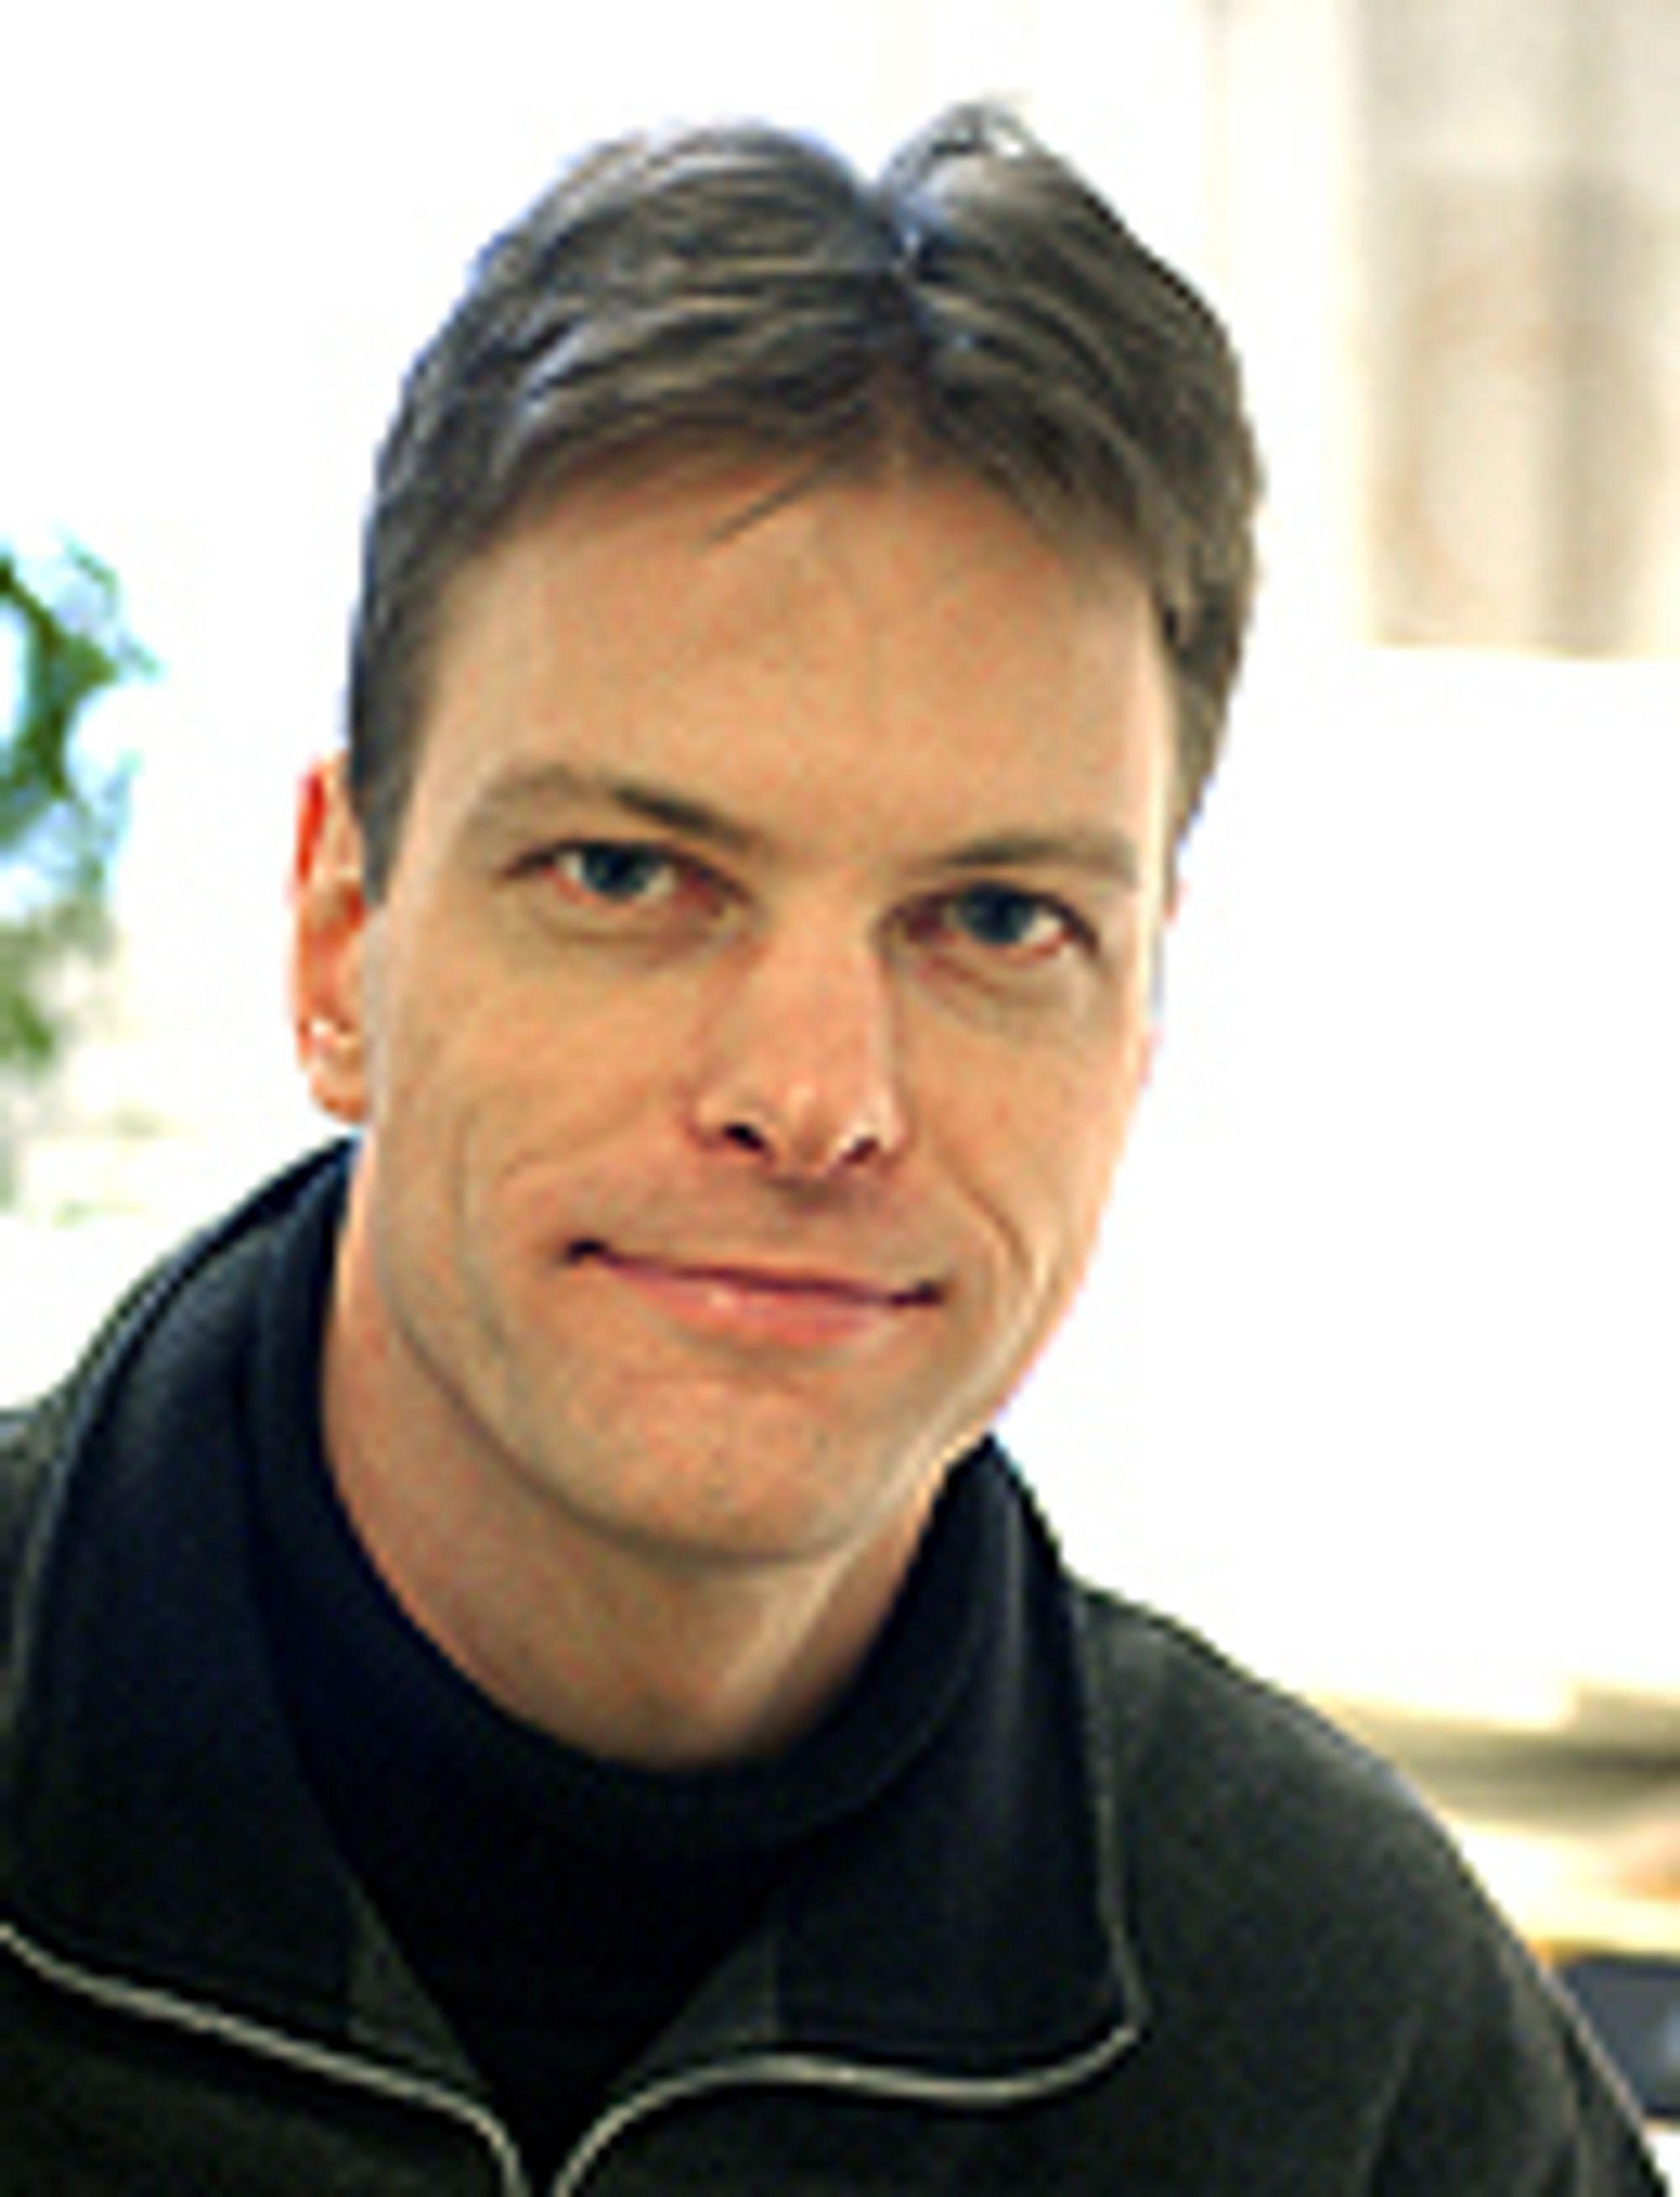 Tommy Svensson, førsteamanuensis i kommunikasjonsteknologi ved Chalmers Tekniske Högskola i Gøteborg.